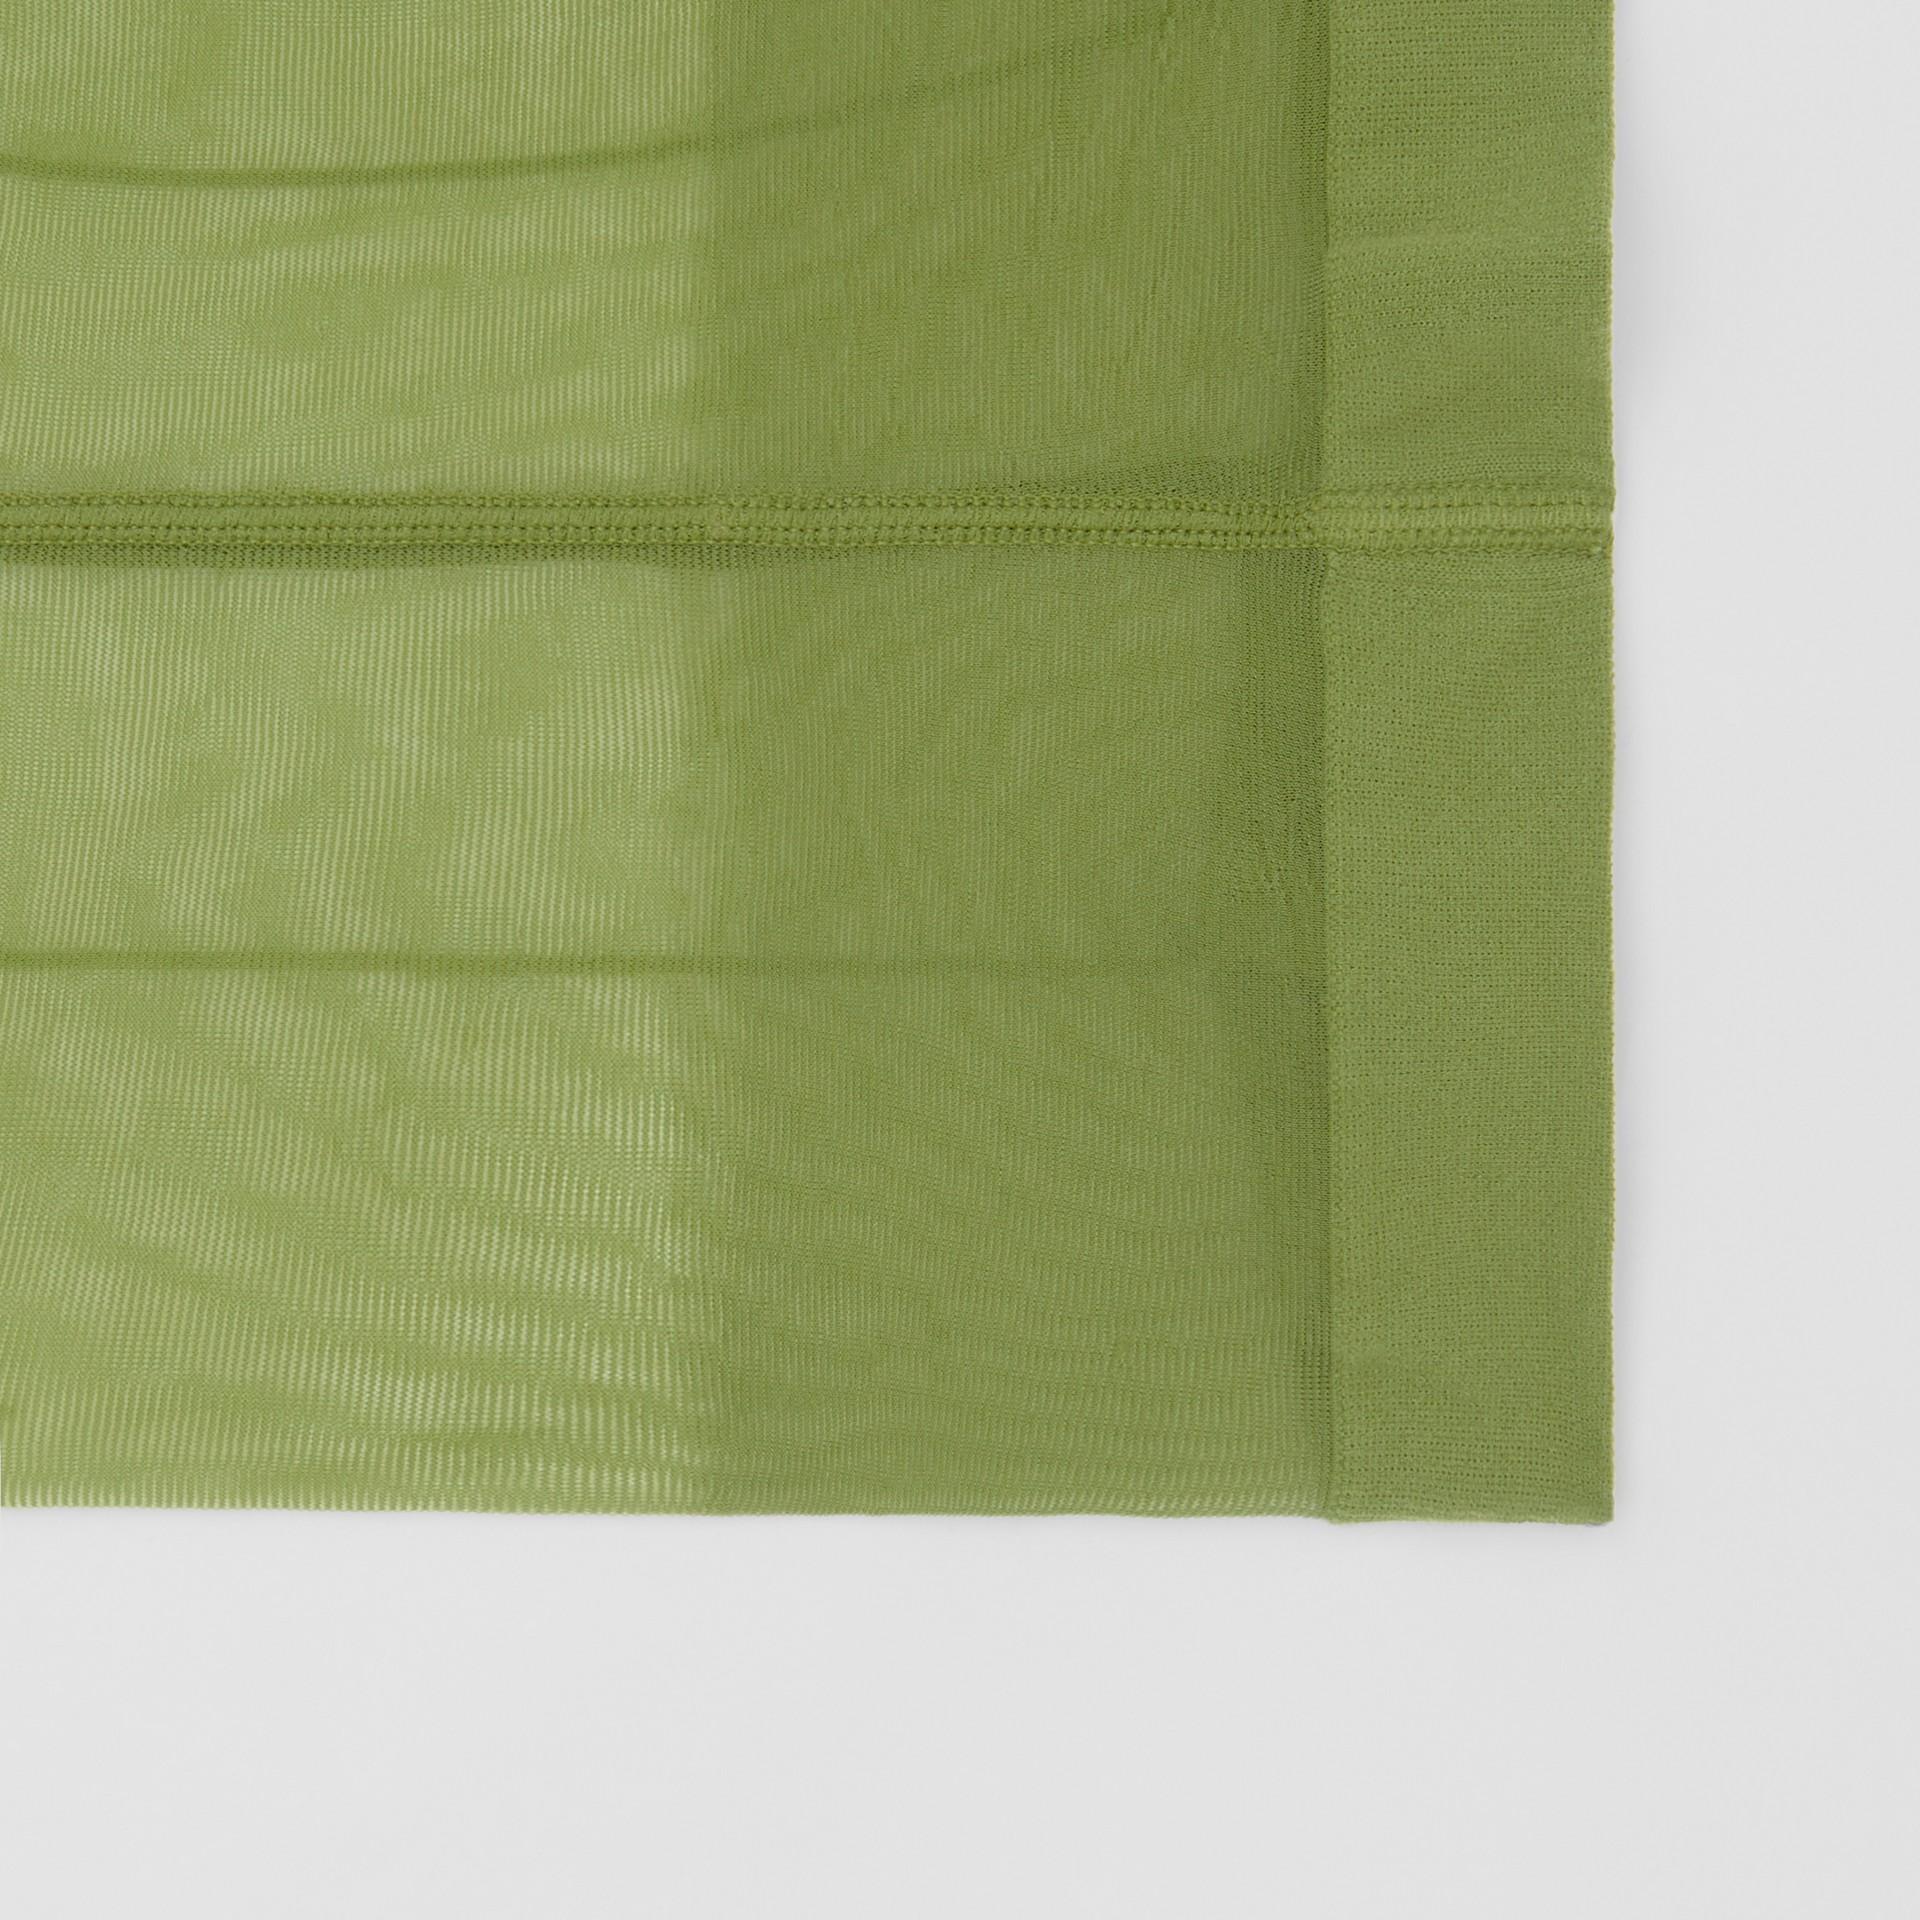 Monogram Motif Seamed Tights in Cedar Green - Women | Burberry Singapore - gallery image 1